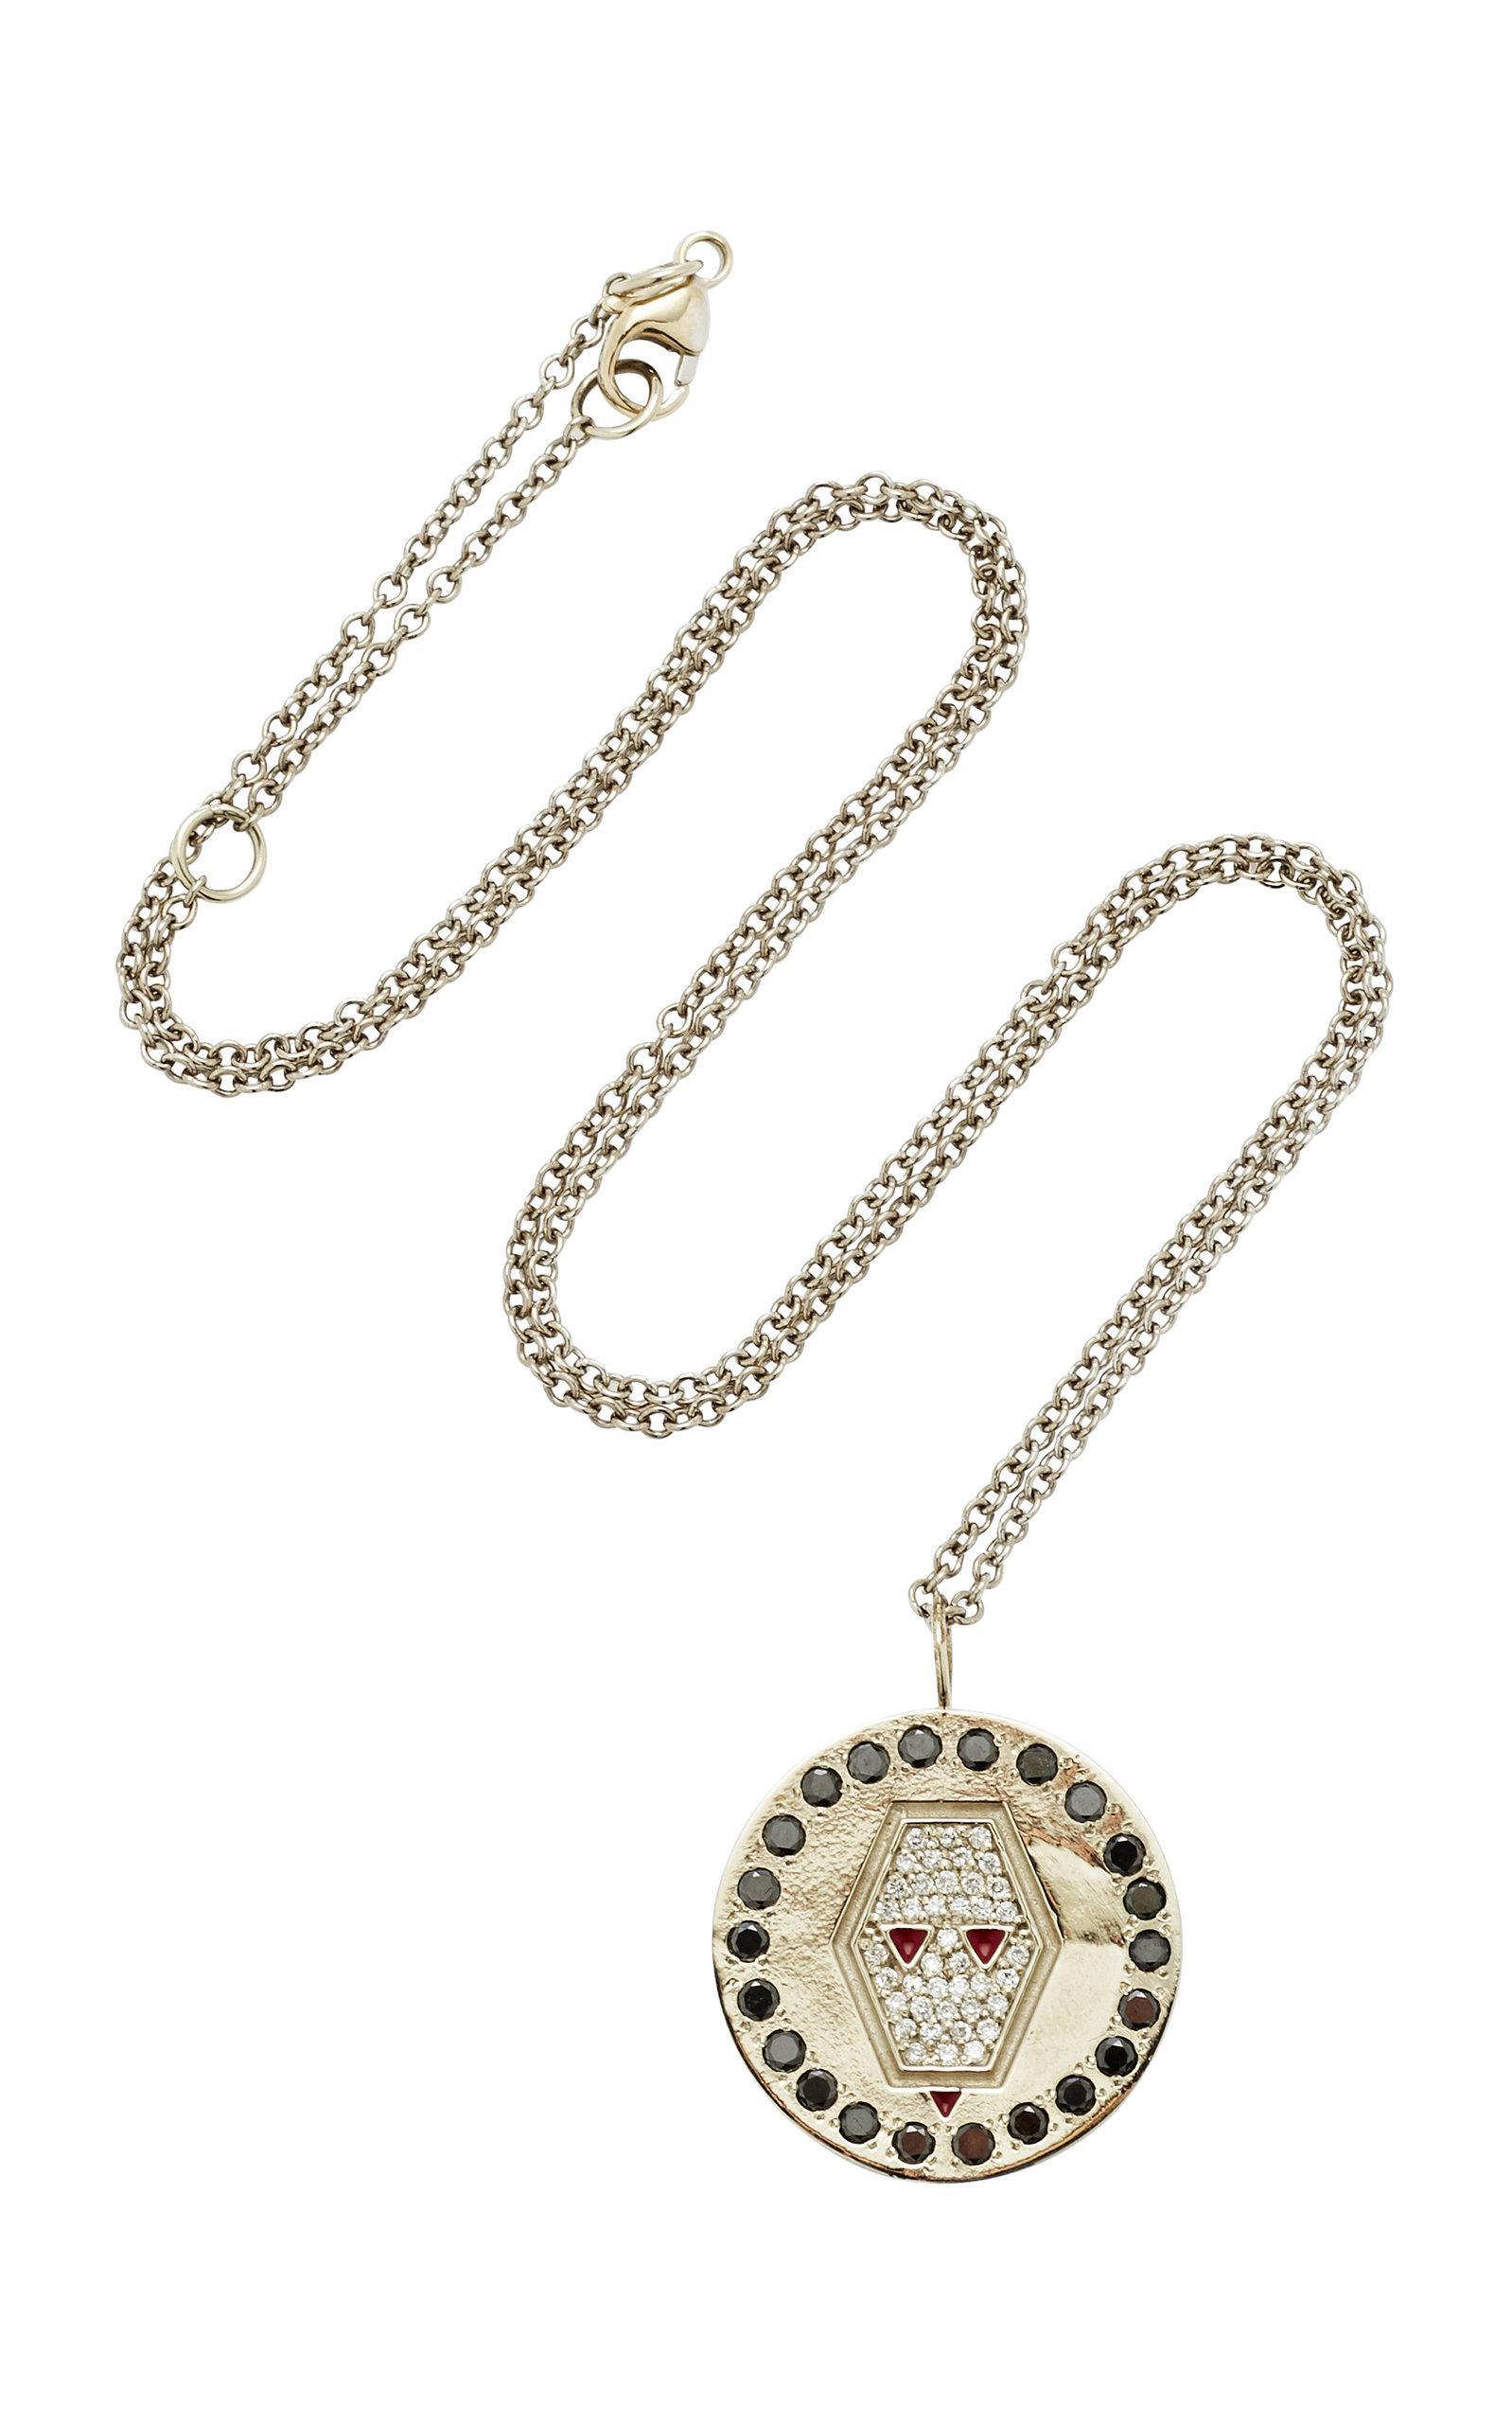 Lion Charm 18K Gold Diamond Necklace Misahara M9P4ECpBs